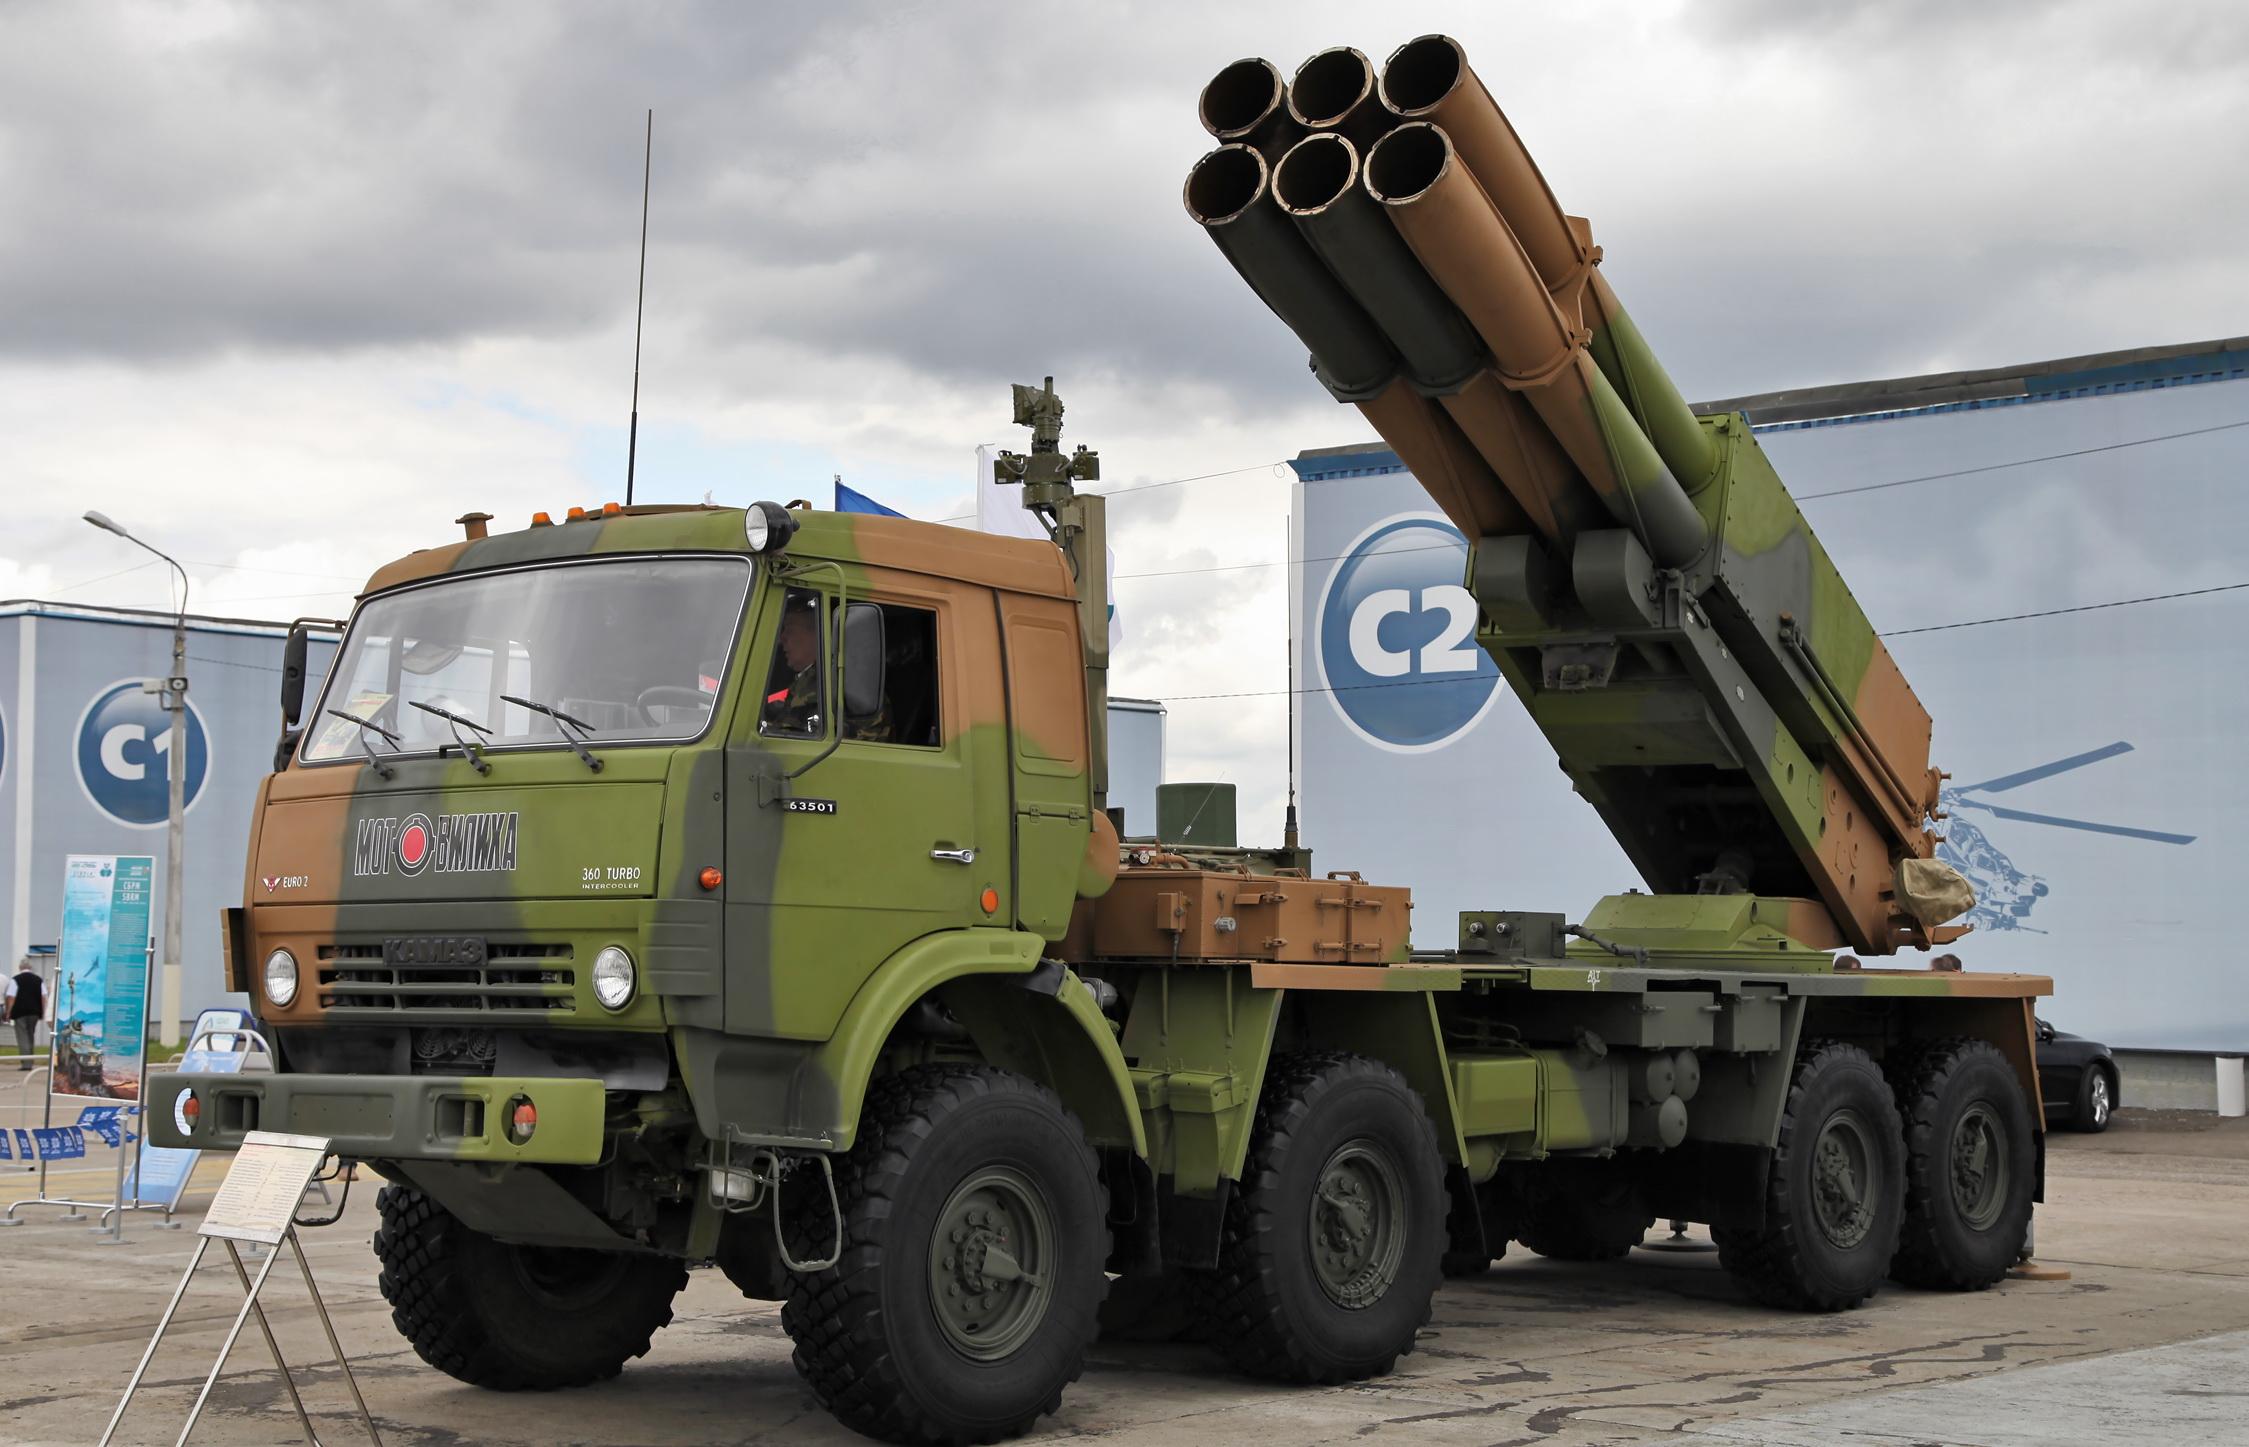 Combat_vehicle_9A52-4_Smerch_MLRS_(3) - Copy.jpg